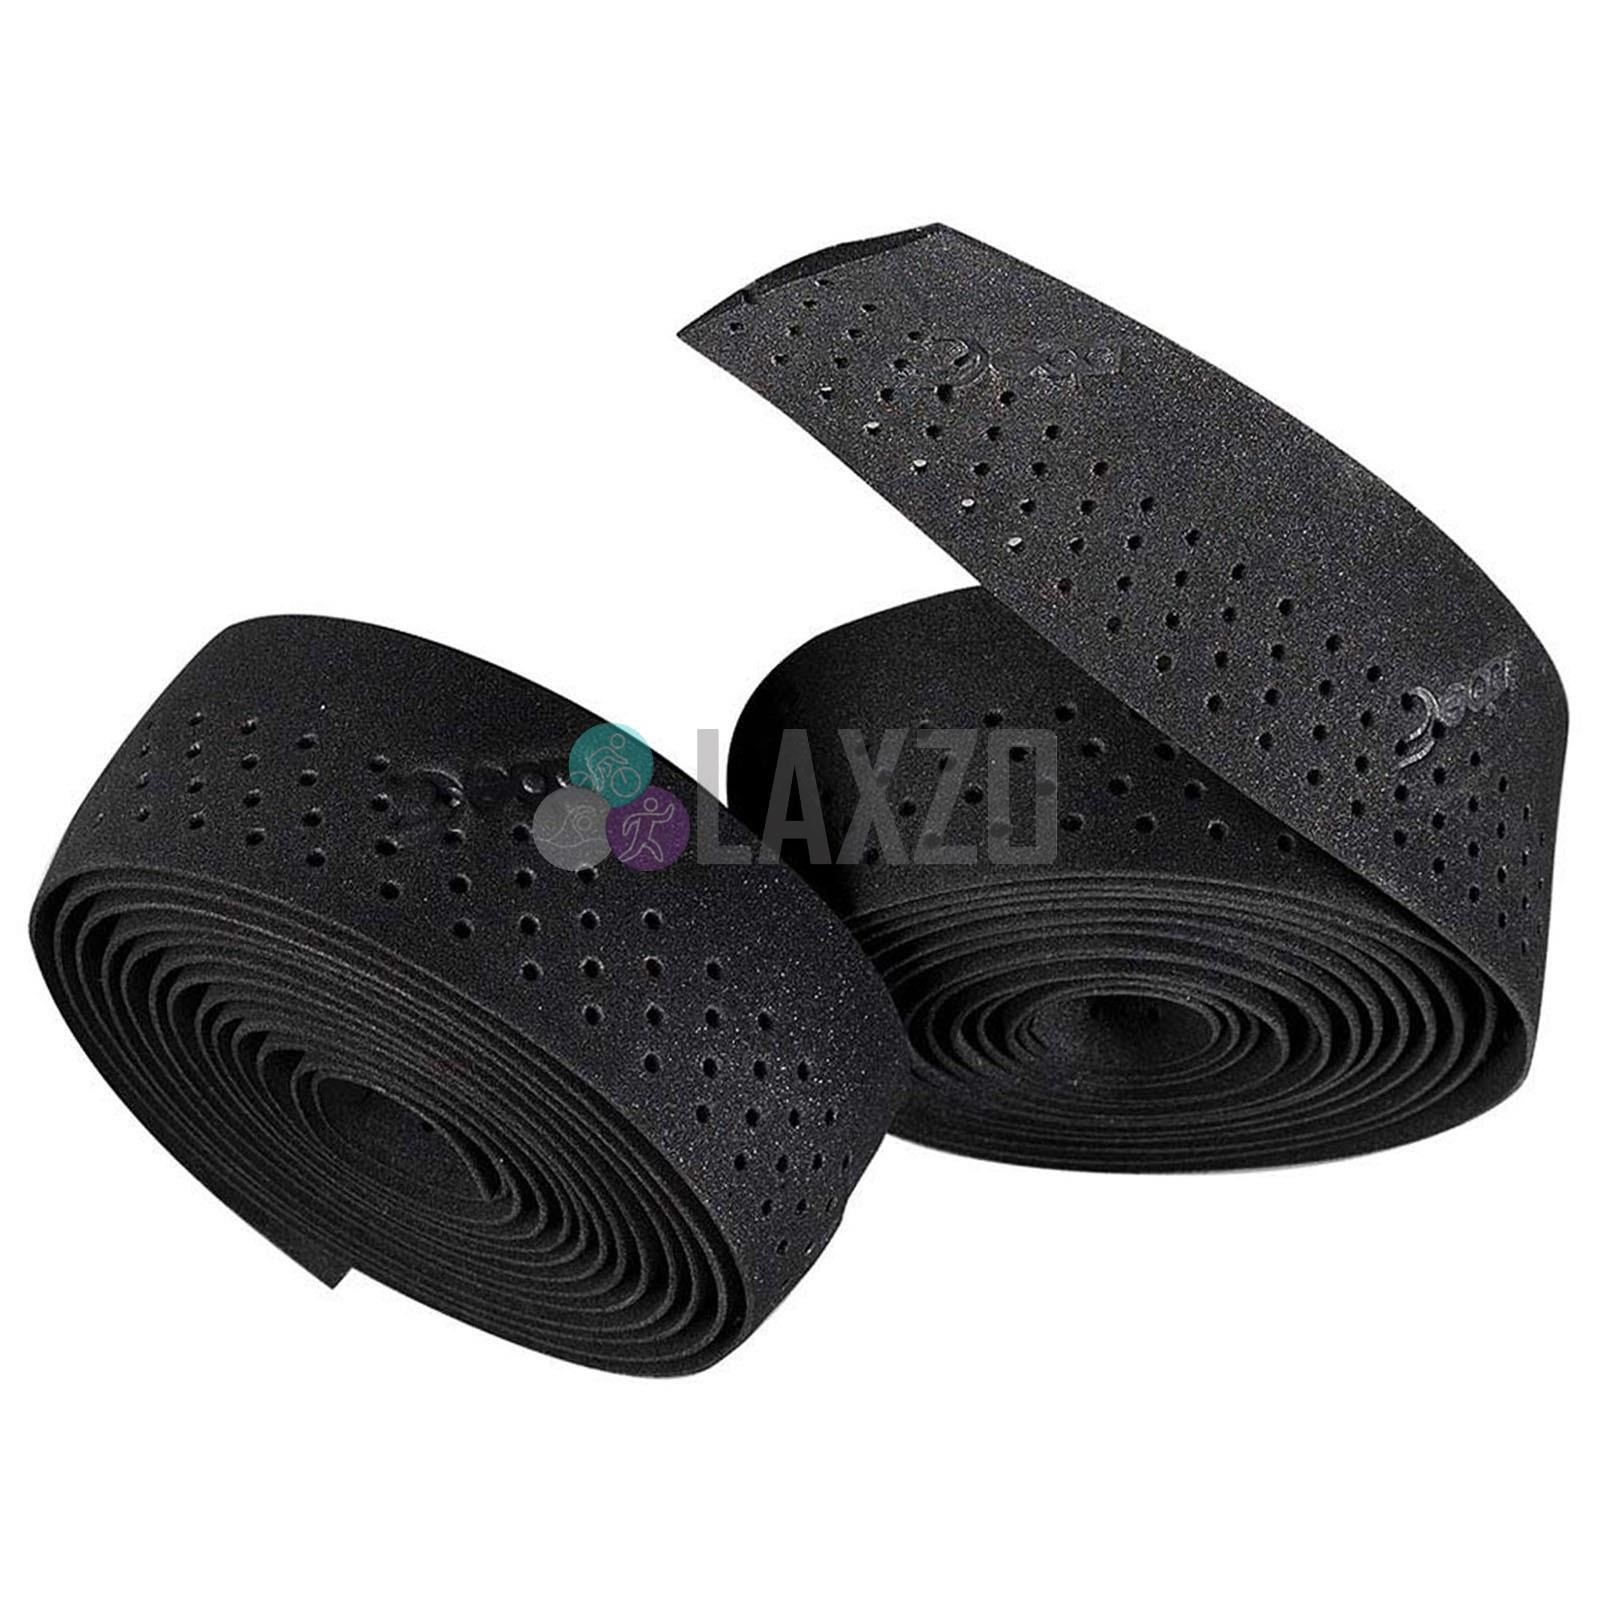 Traforato Black Perforated Handlebar Bar Tape Deda Padded